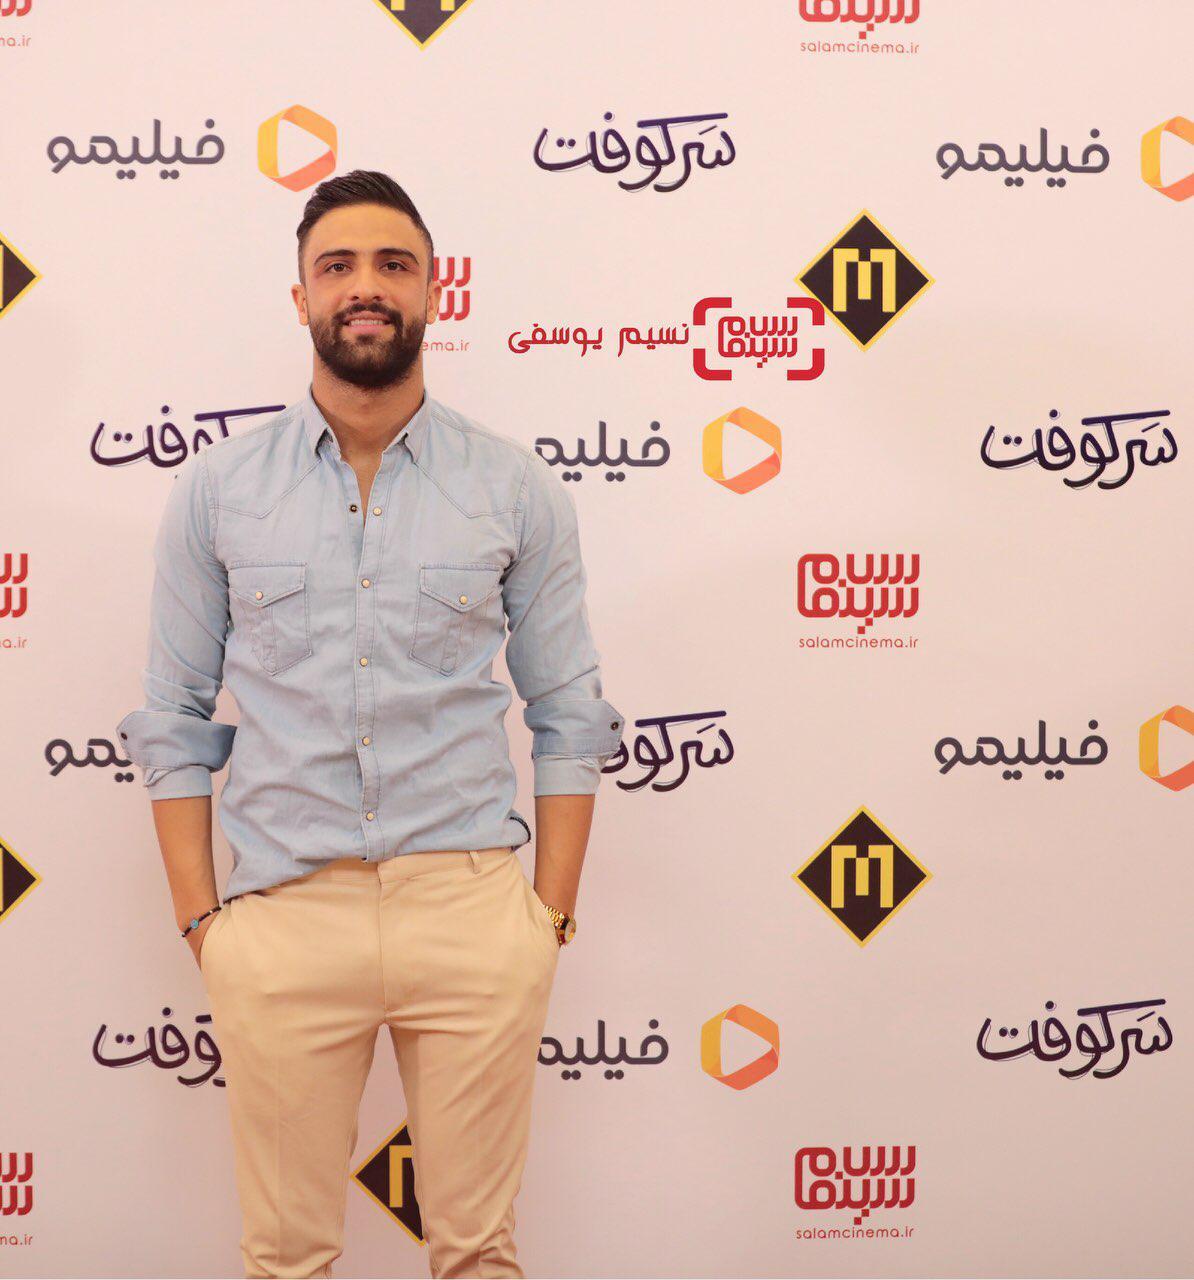 محمد معماریان دراکران خصوصی فیلم «سرکوفت» / گزارش تصویری